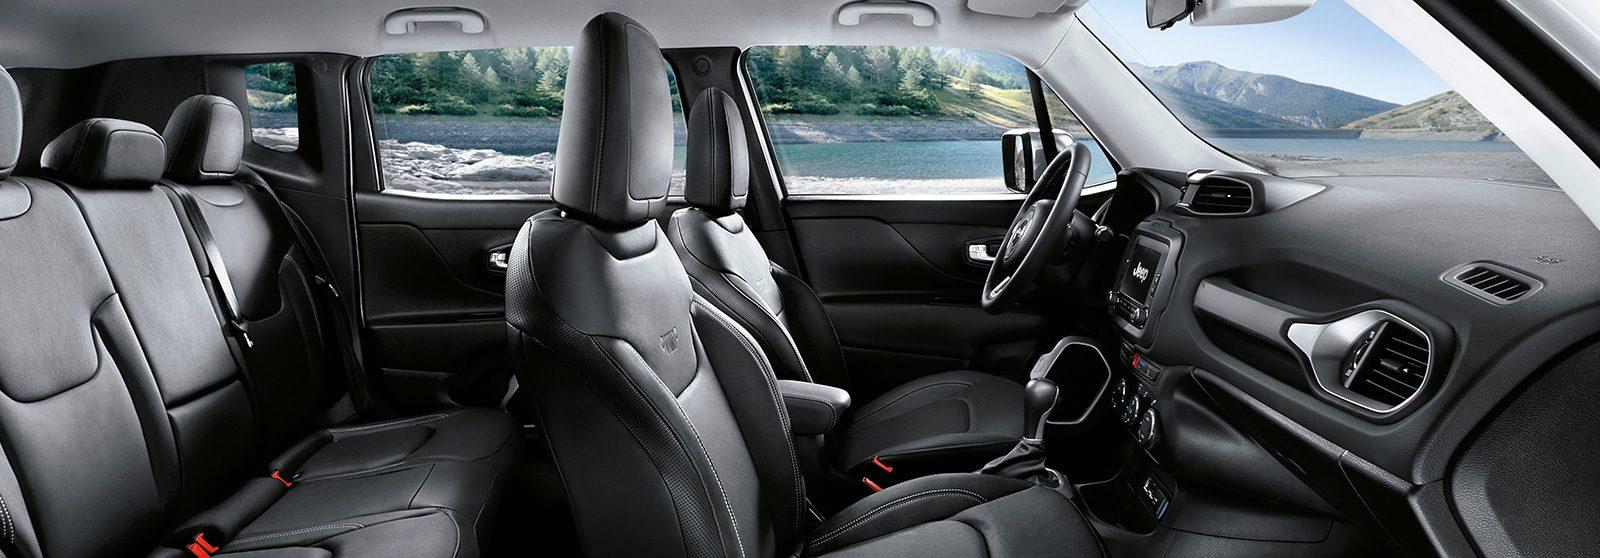 Jeep® Renegade | Kompakt-SUV | Interieur - Sitze und Navigation